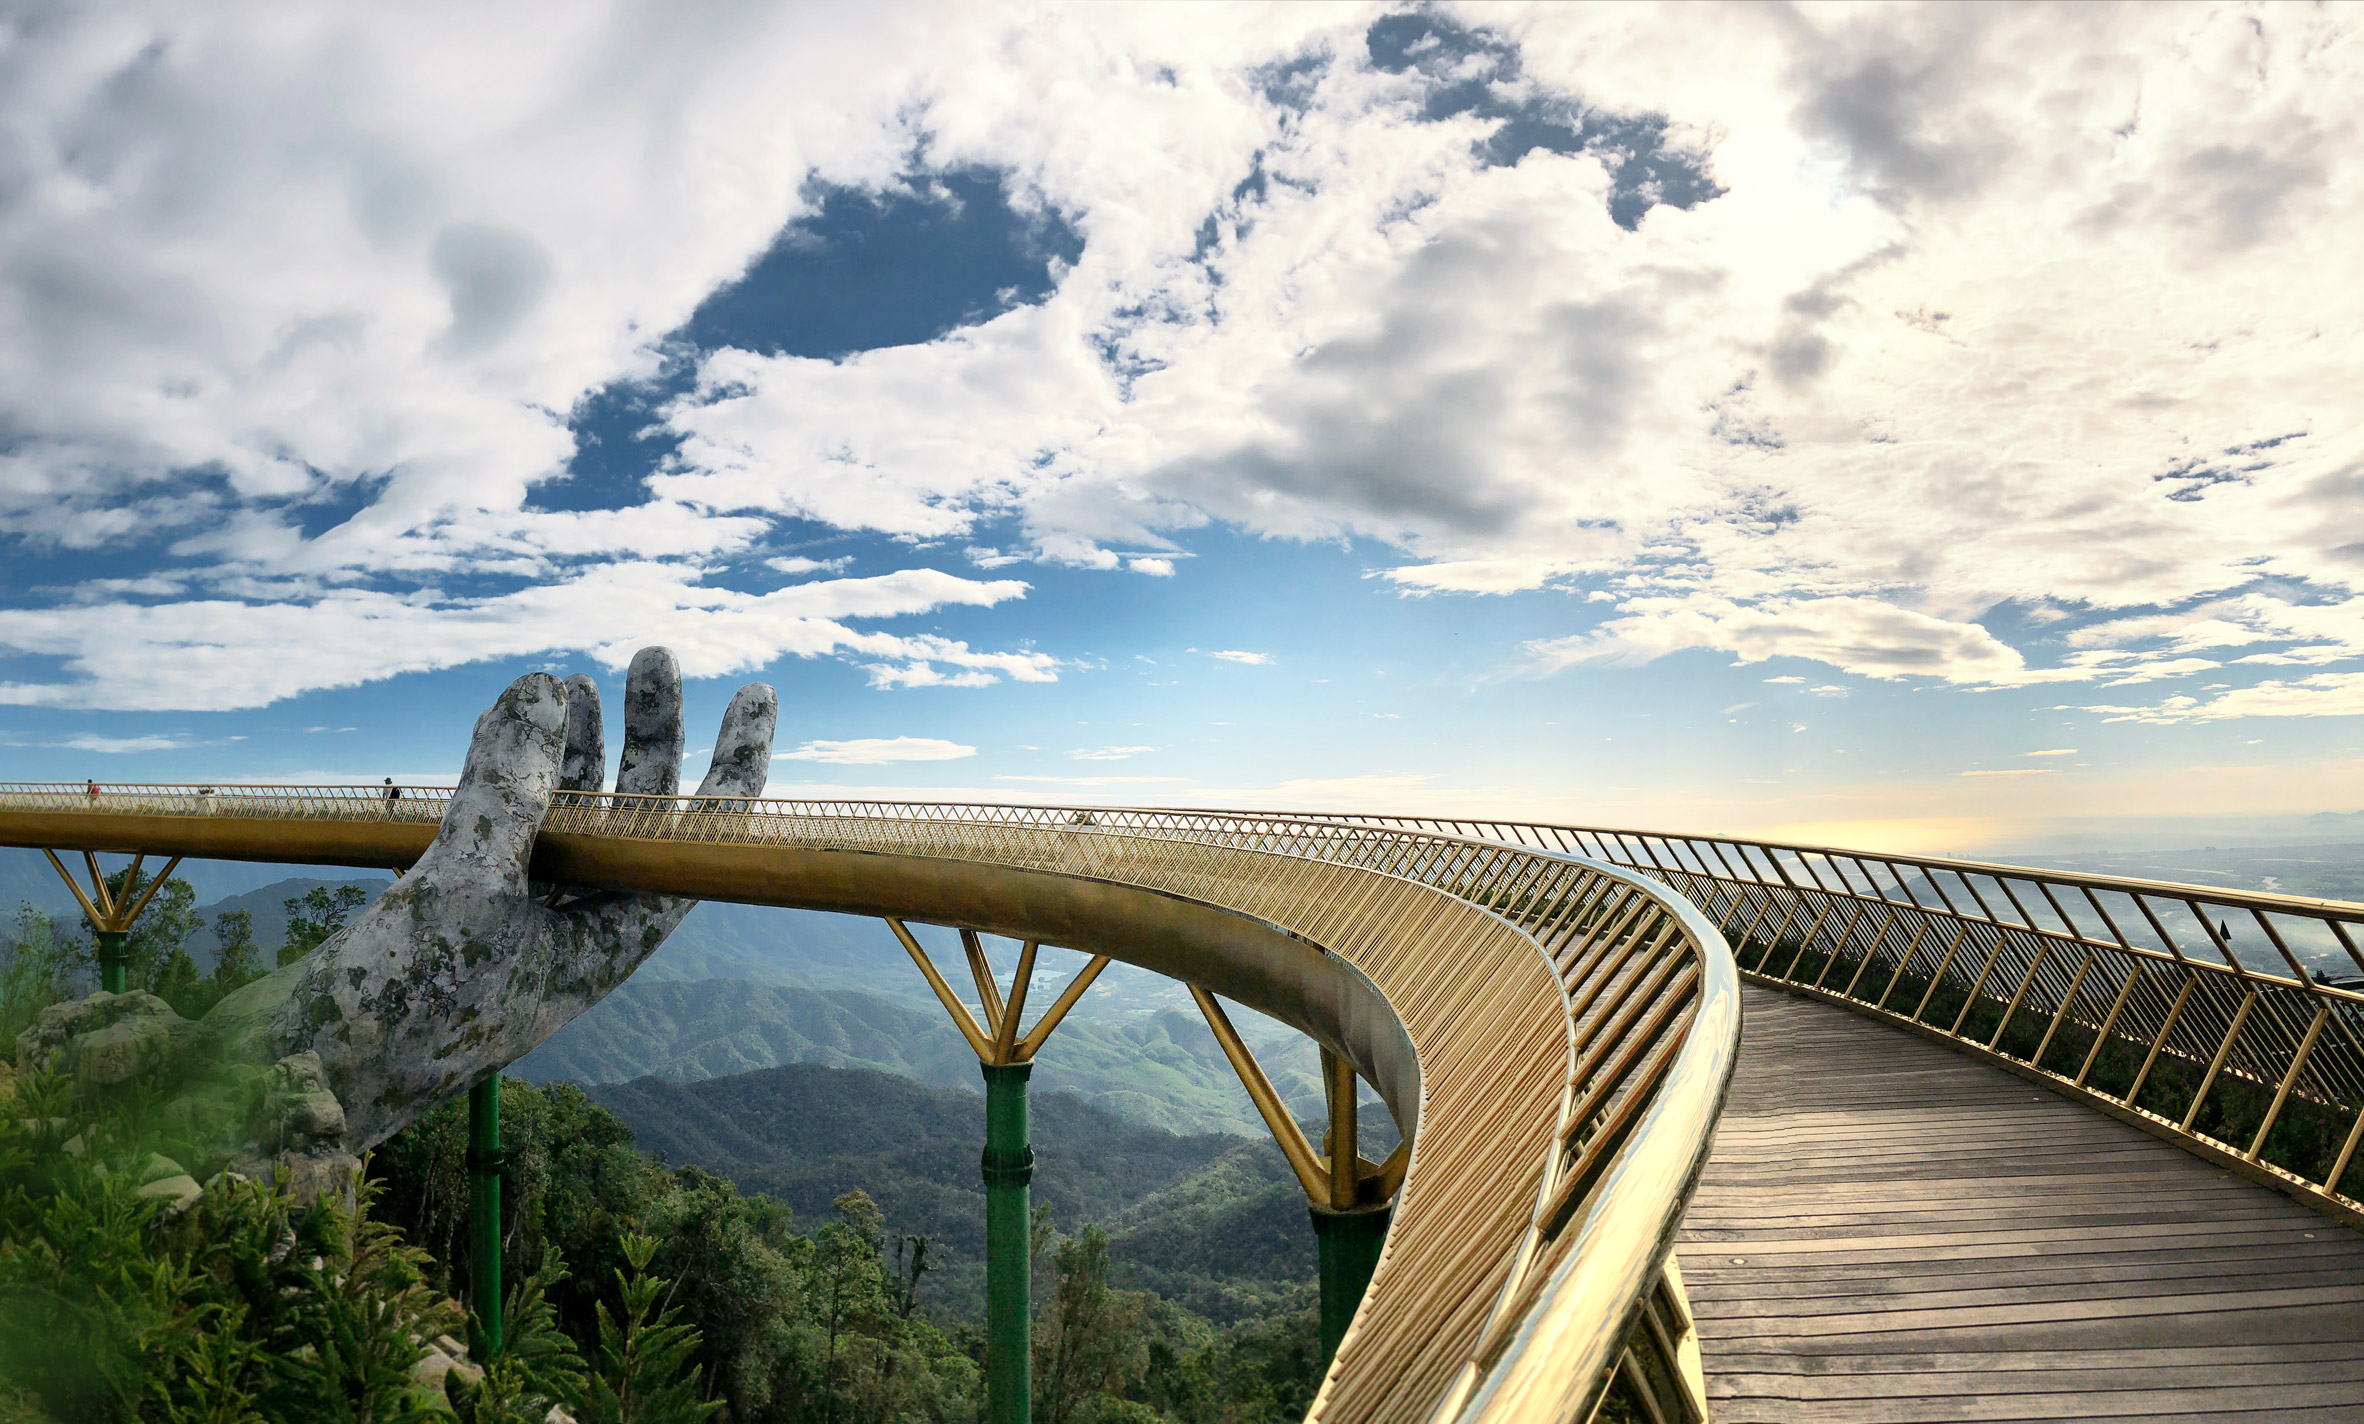 Vietnam S Cau Vang Bridge Is Like None Other Kids News Article